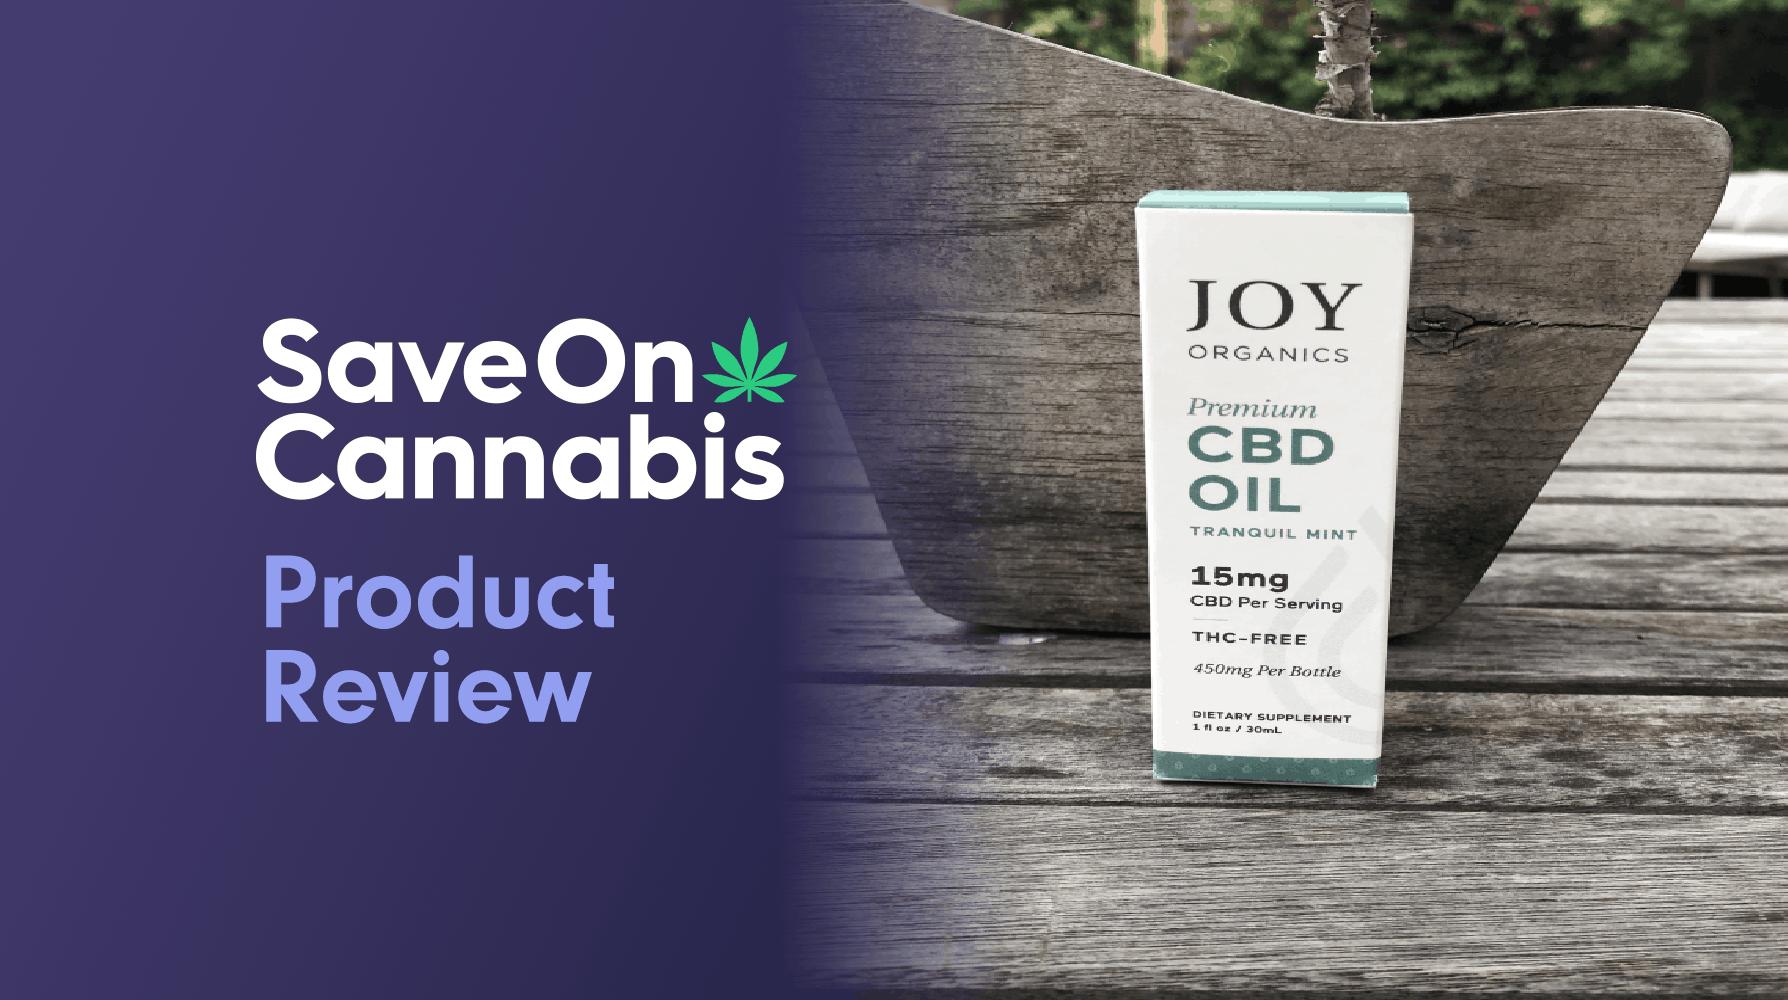 joy organics tranquil mint 15 mg save on cannabis review website